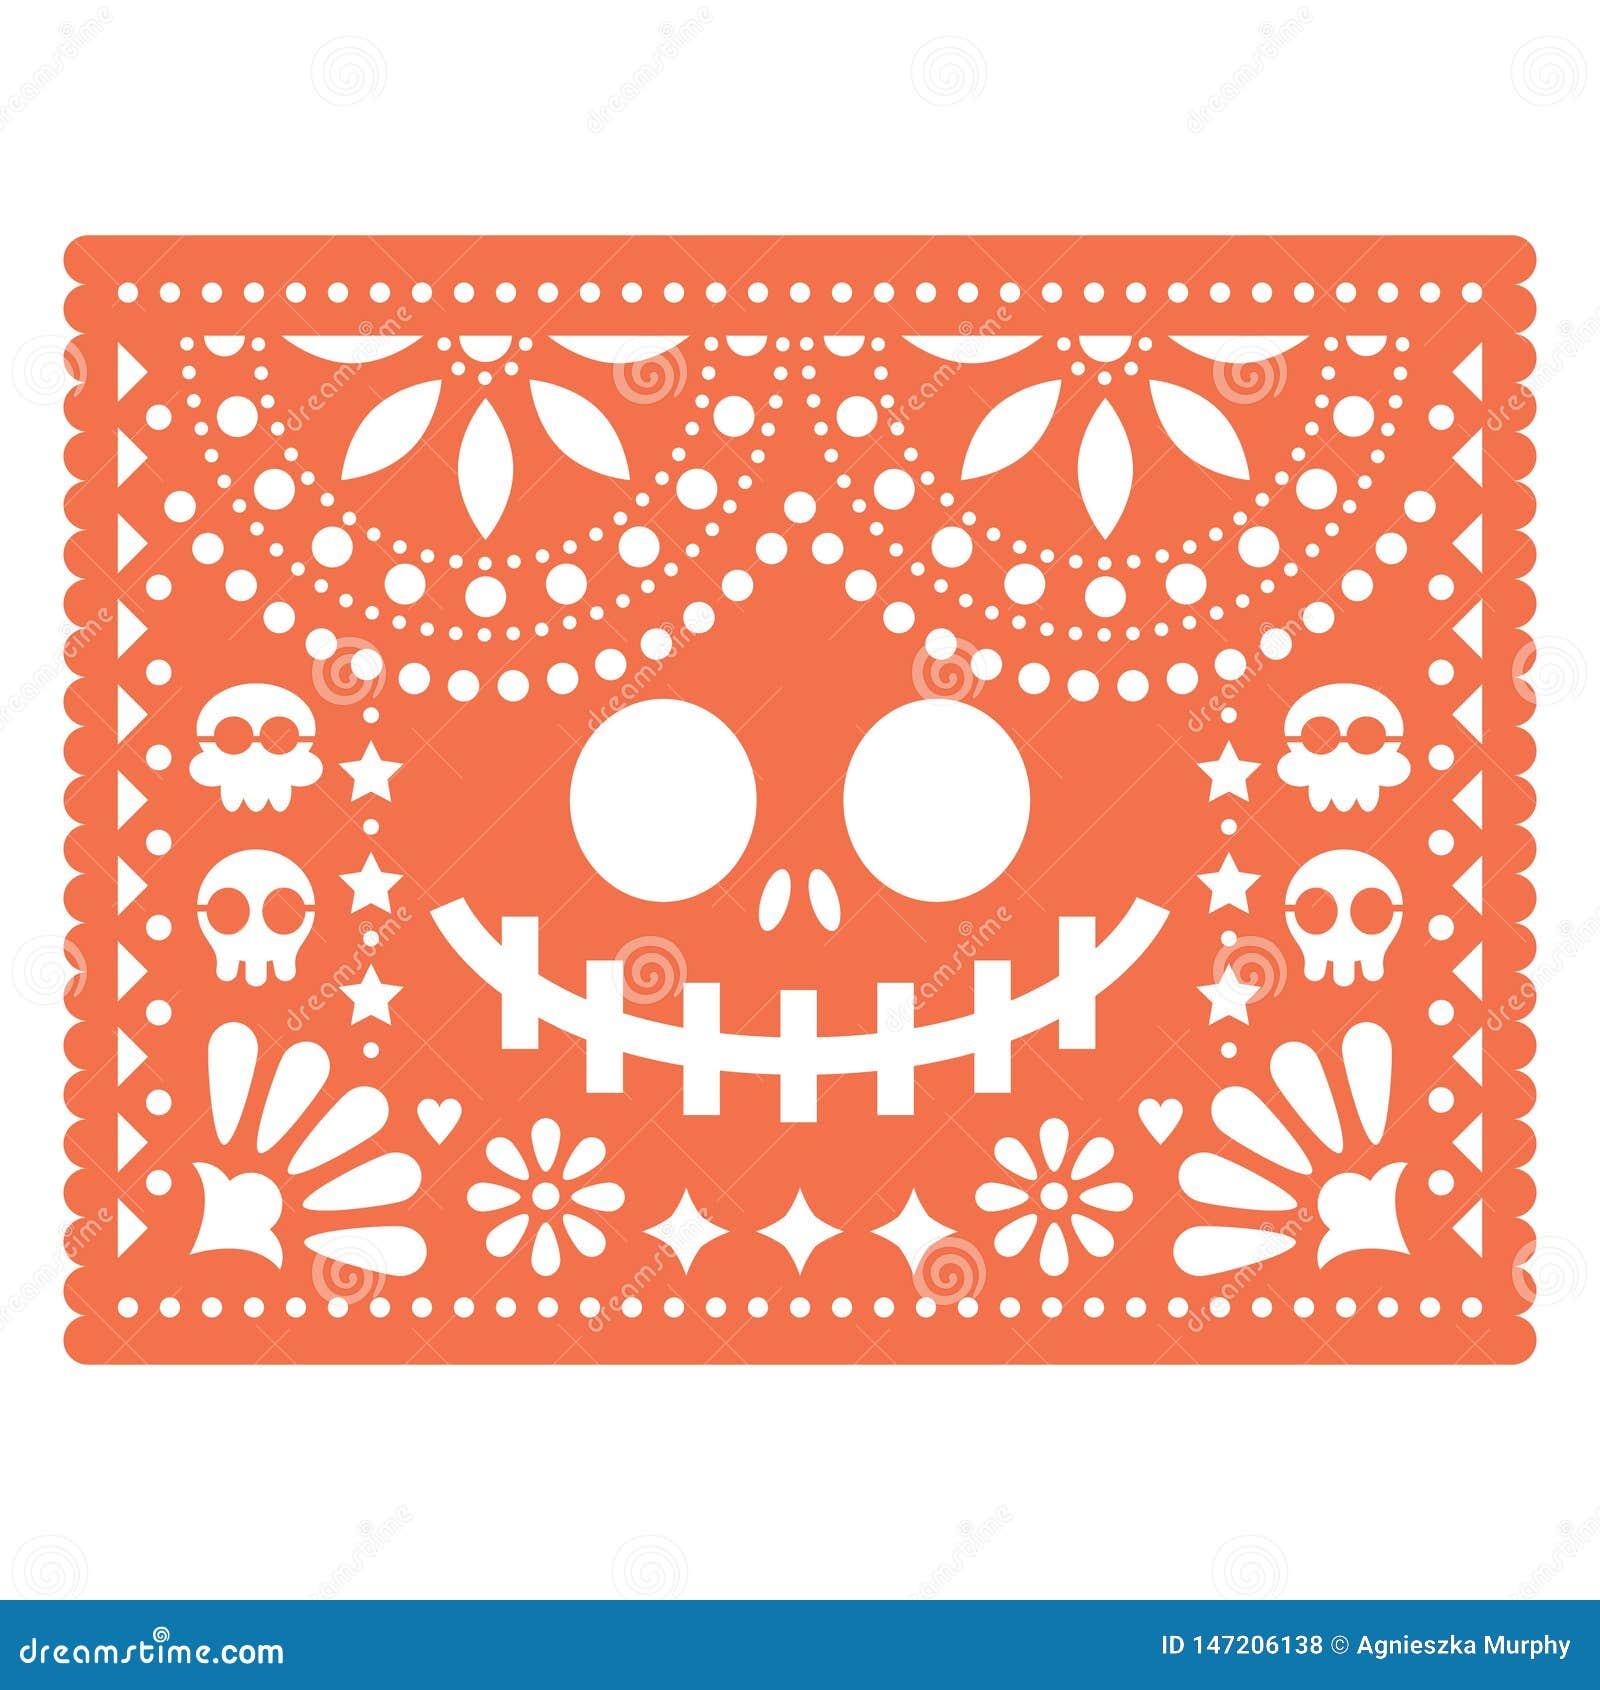 Halloween Papel Picado Design With Skulls And Pumpkin